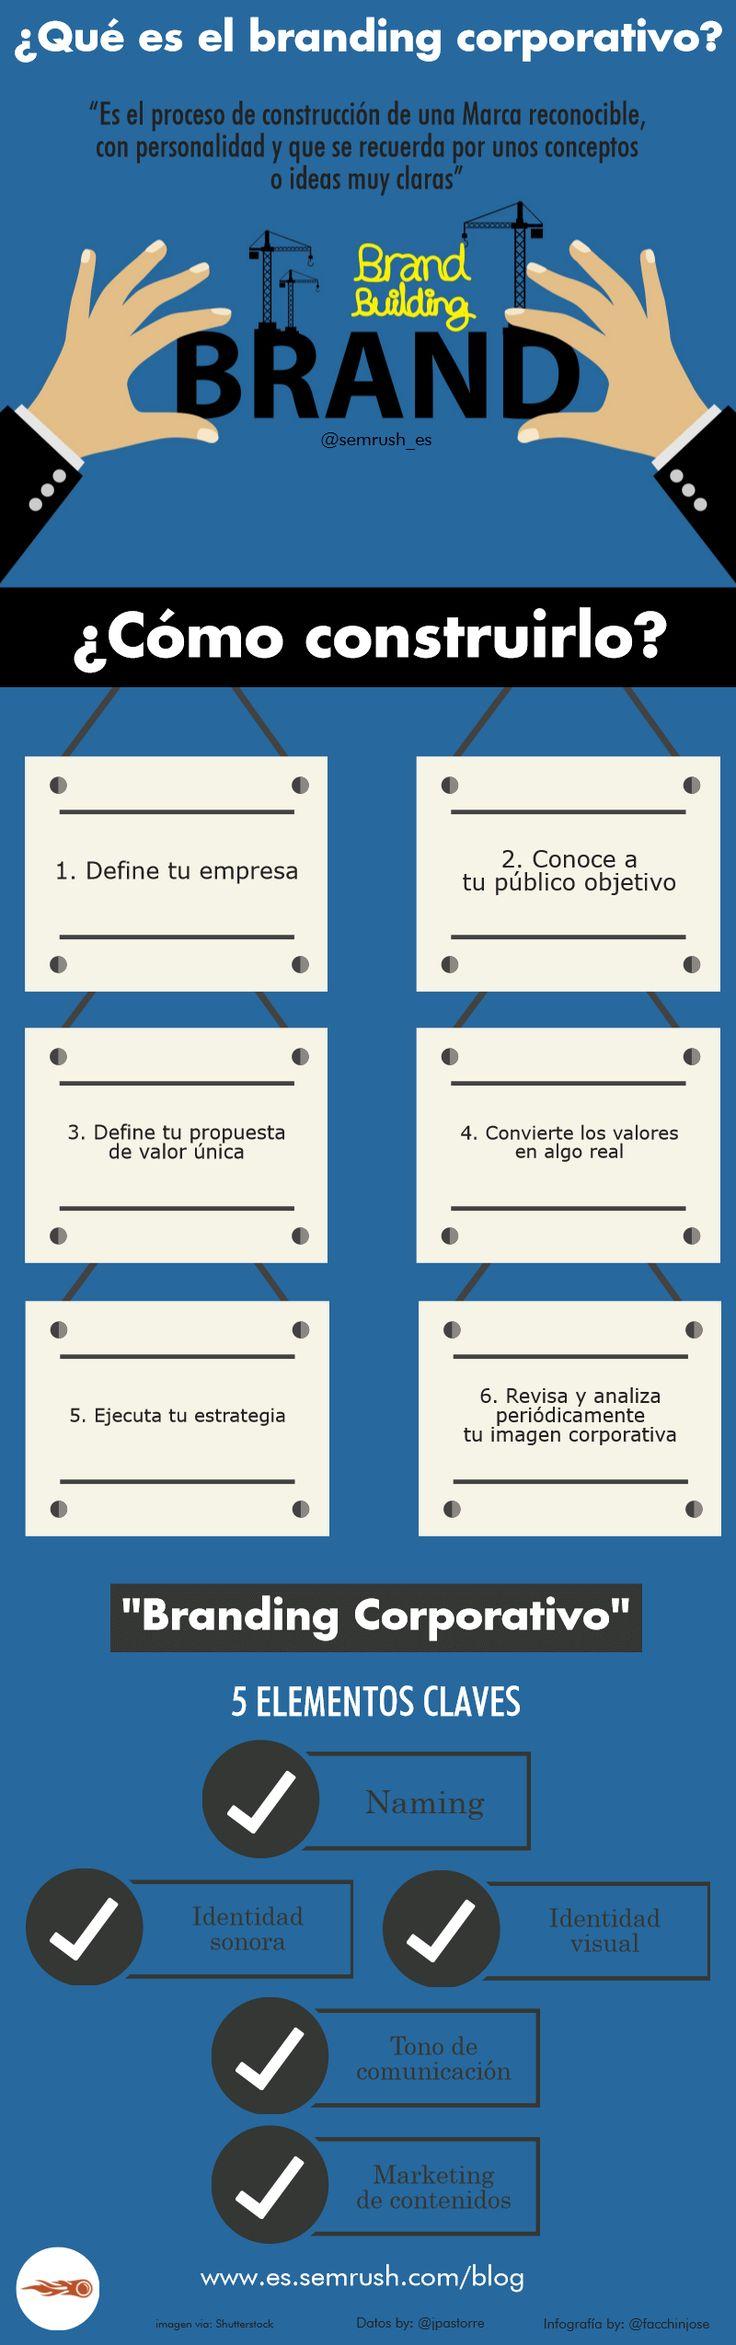 Branding Corporativo #infografia #infographic #marketing